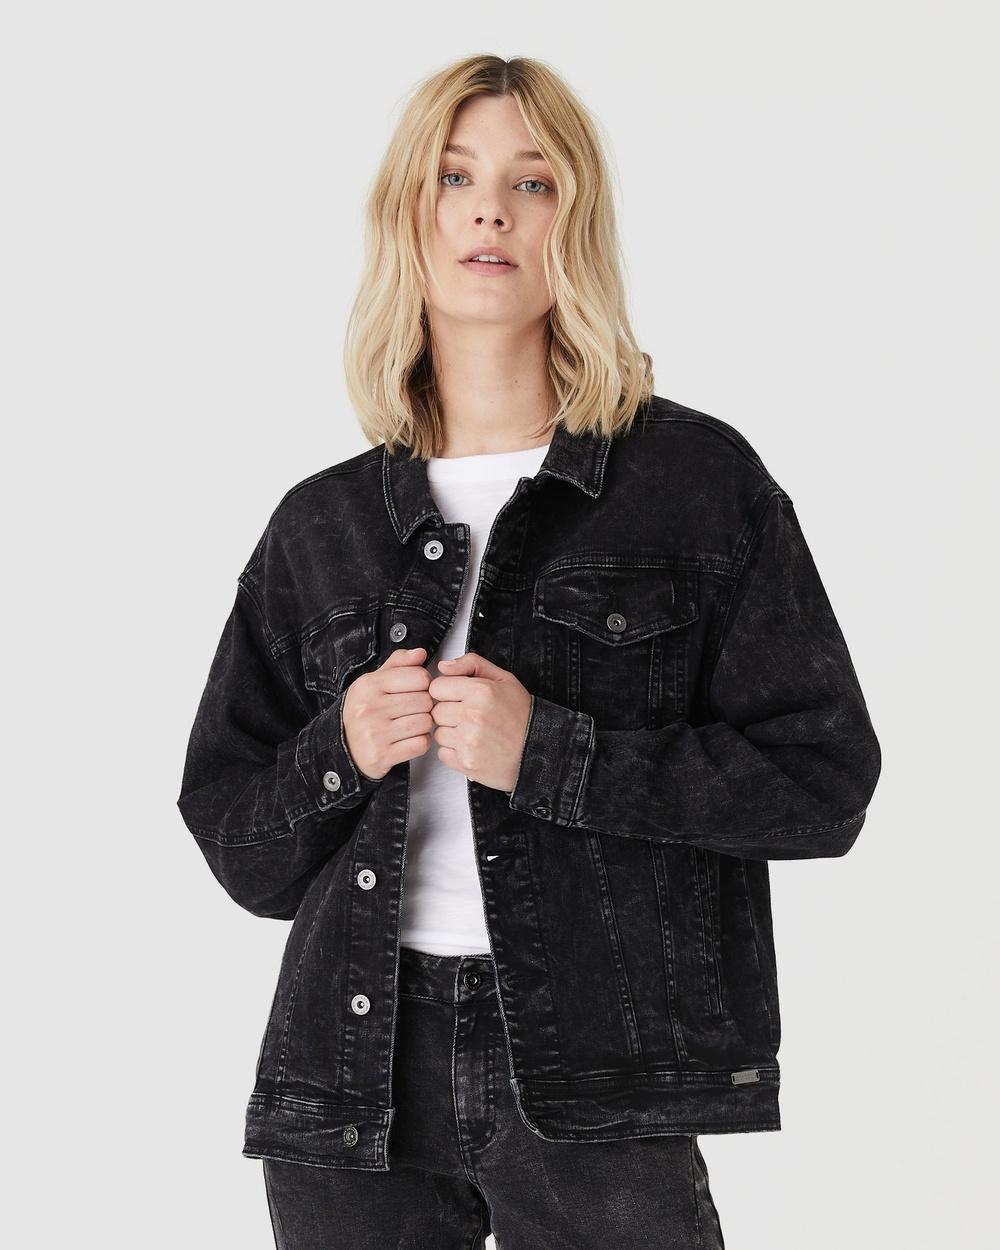 Jac & Mooki Delta Trucker Jacket Denim jacket black acid wash